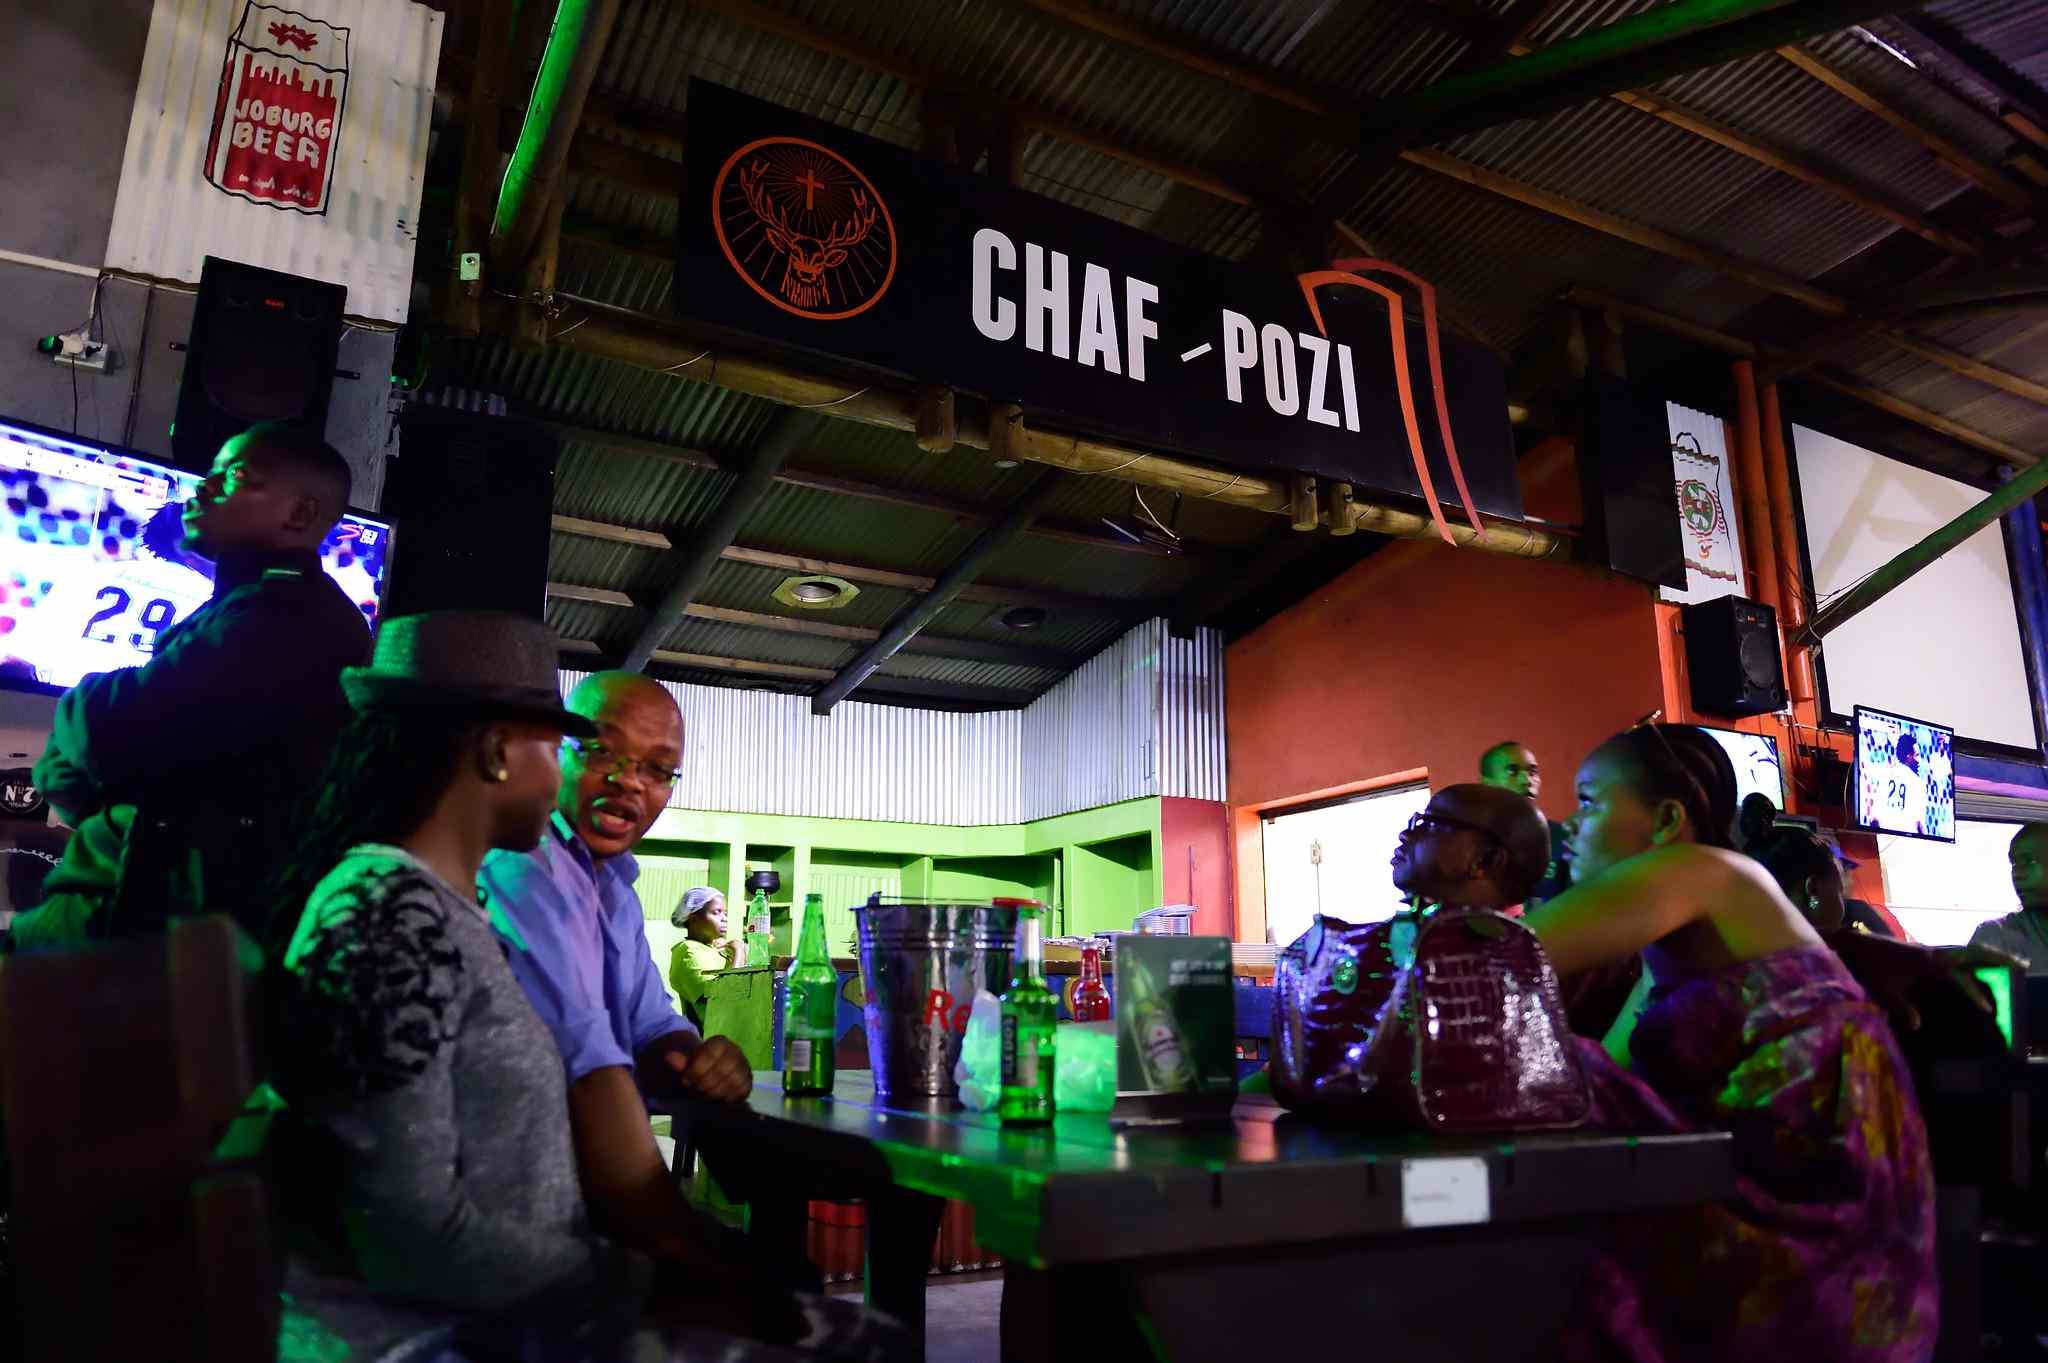 Bar patrons in Chaf Pozi shisa nyama, Soweto